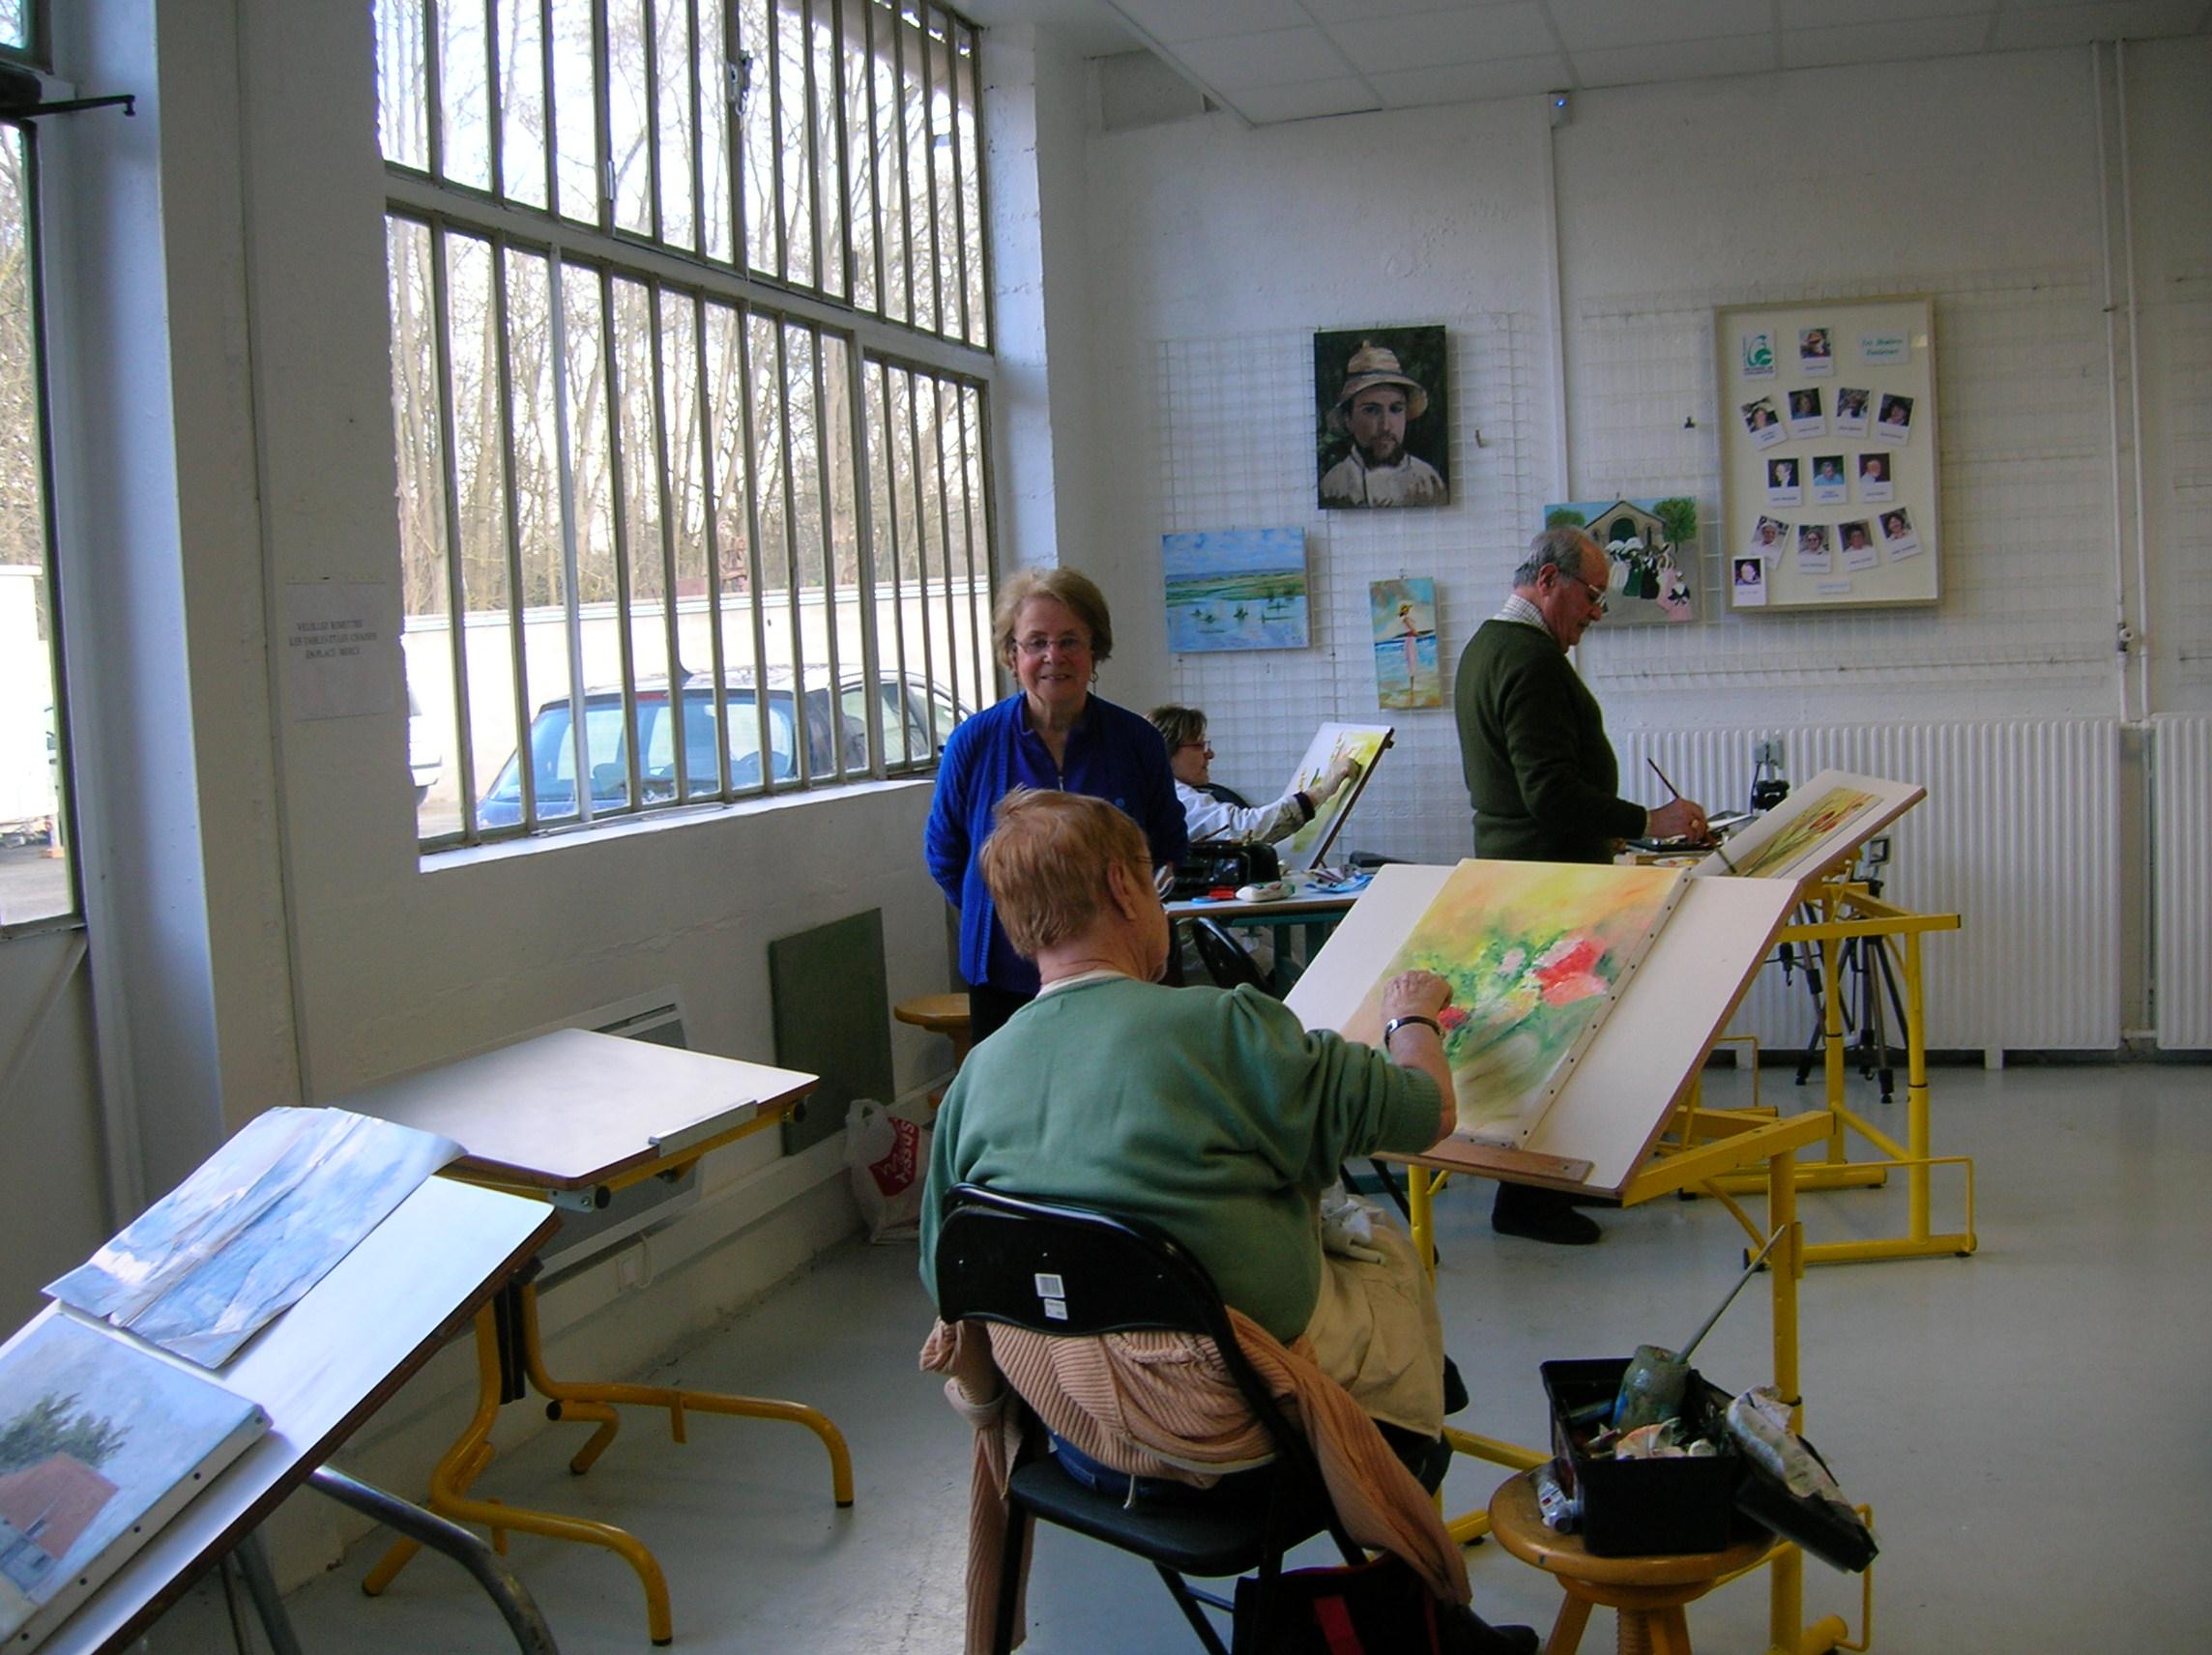 L'Atelier, Avril 2015 02